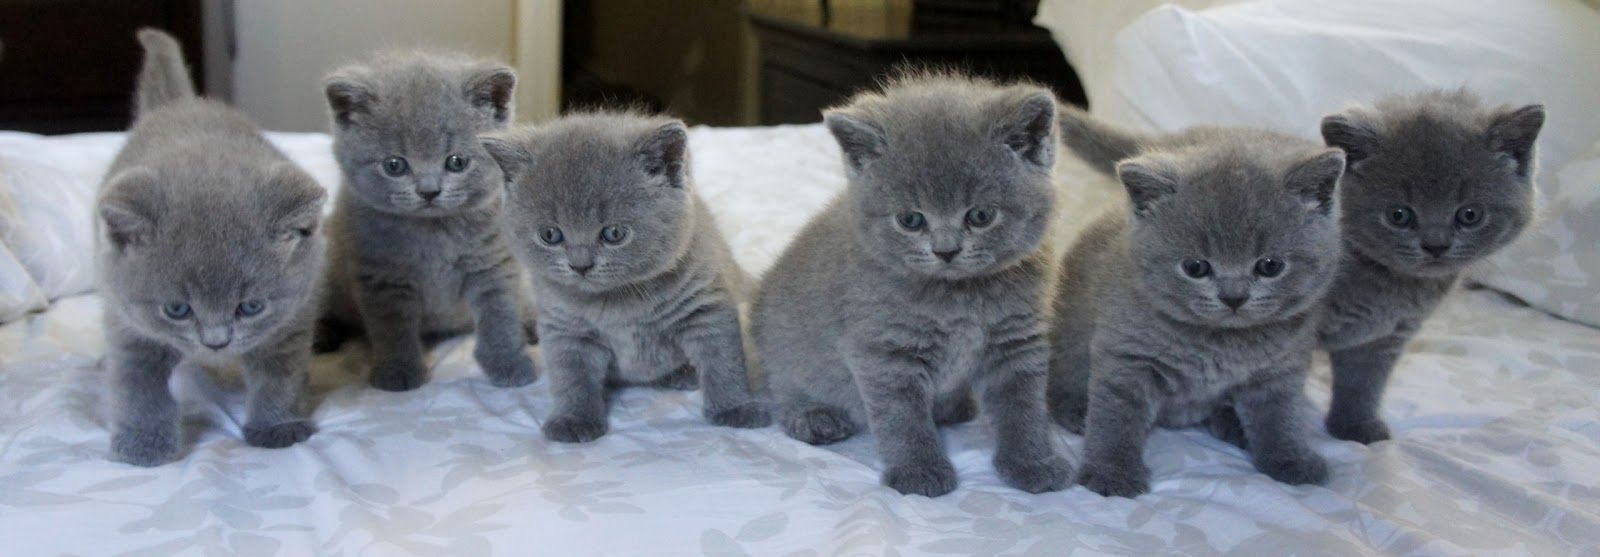 British shorthair cat edmonton